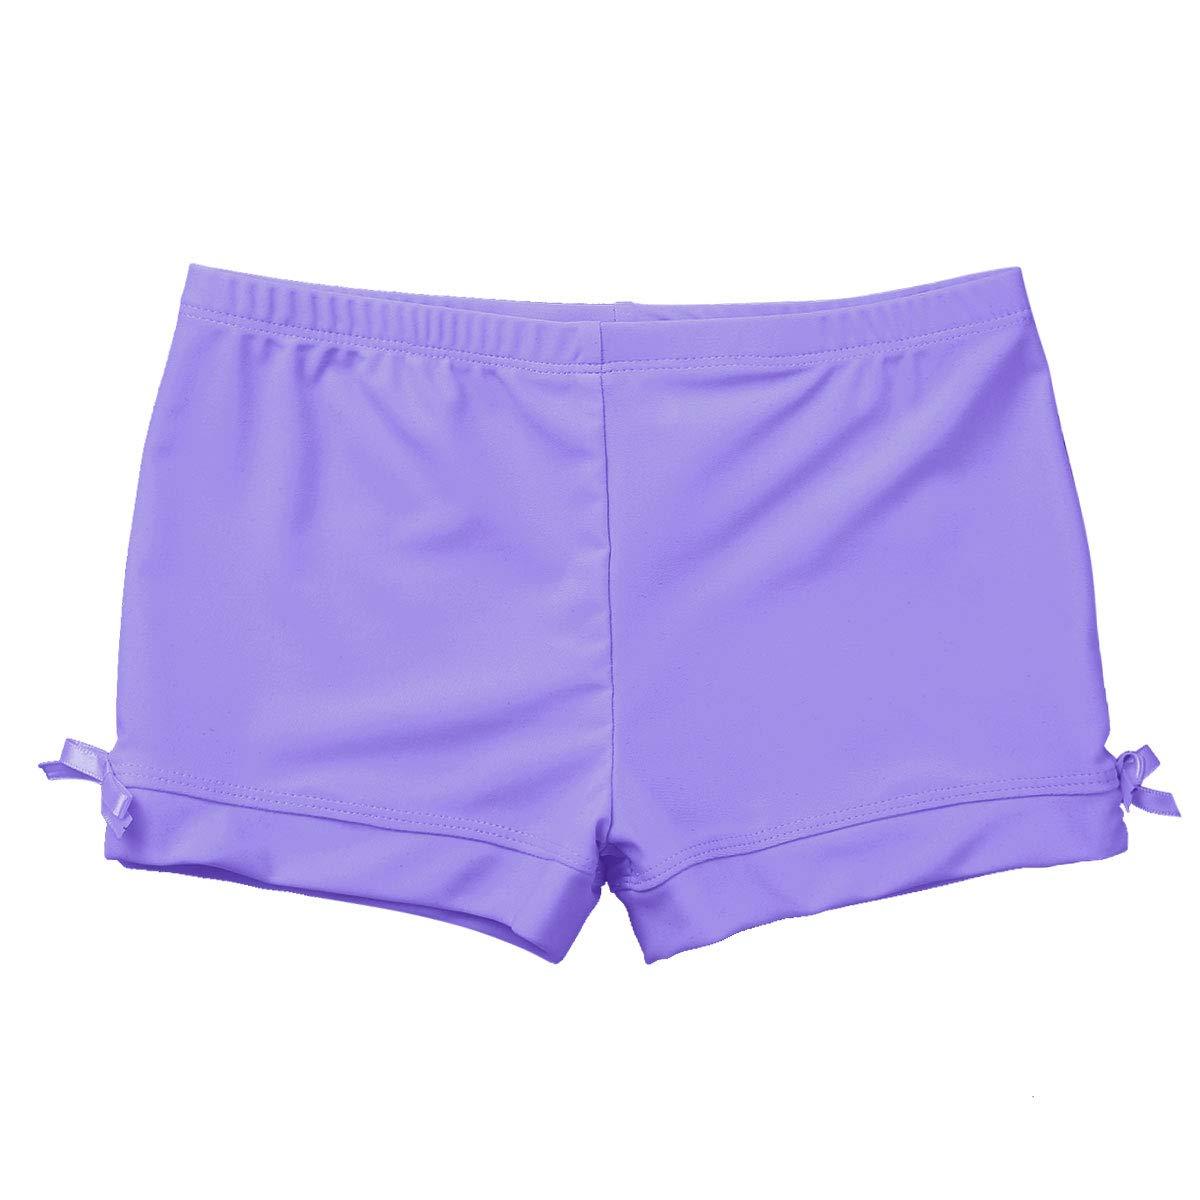 Agoky Kids Girls Gymnastics Workout Yoga Athletic Sports Training Bike Short Light_Purple Boy-Cut 3